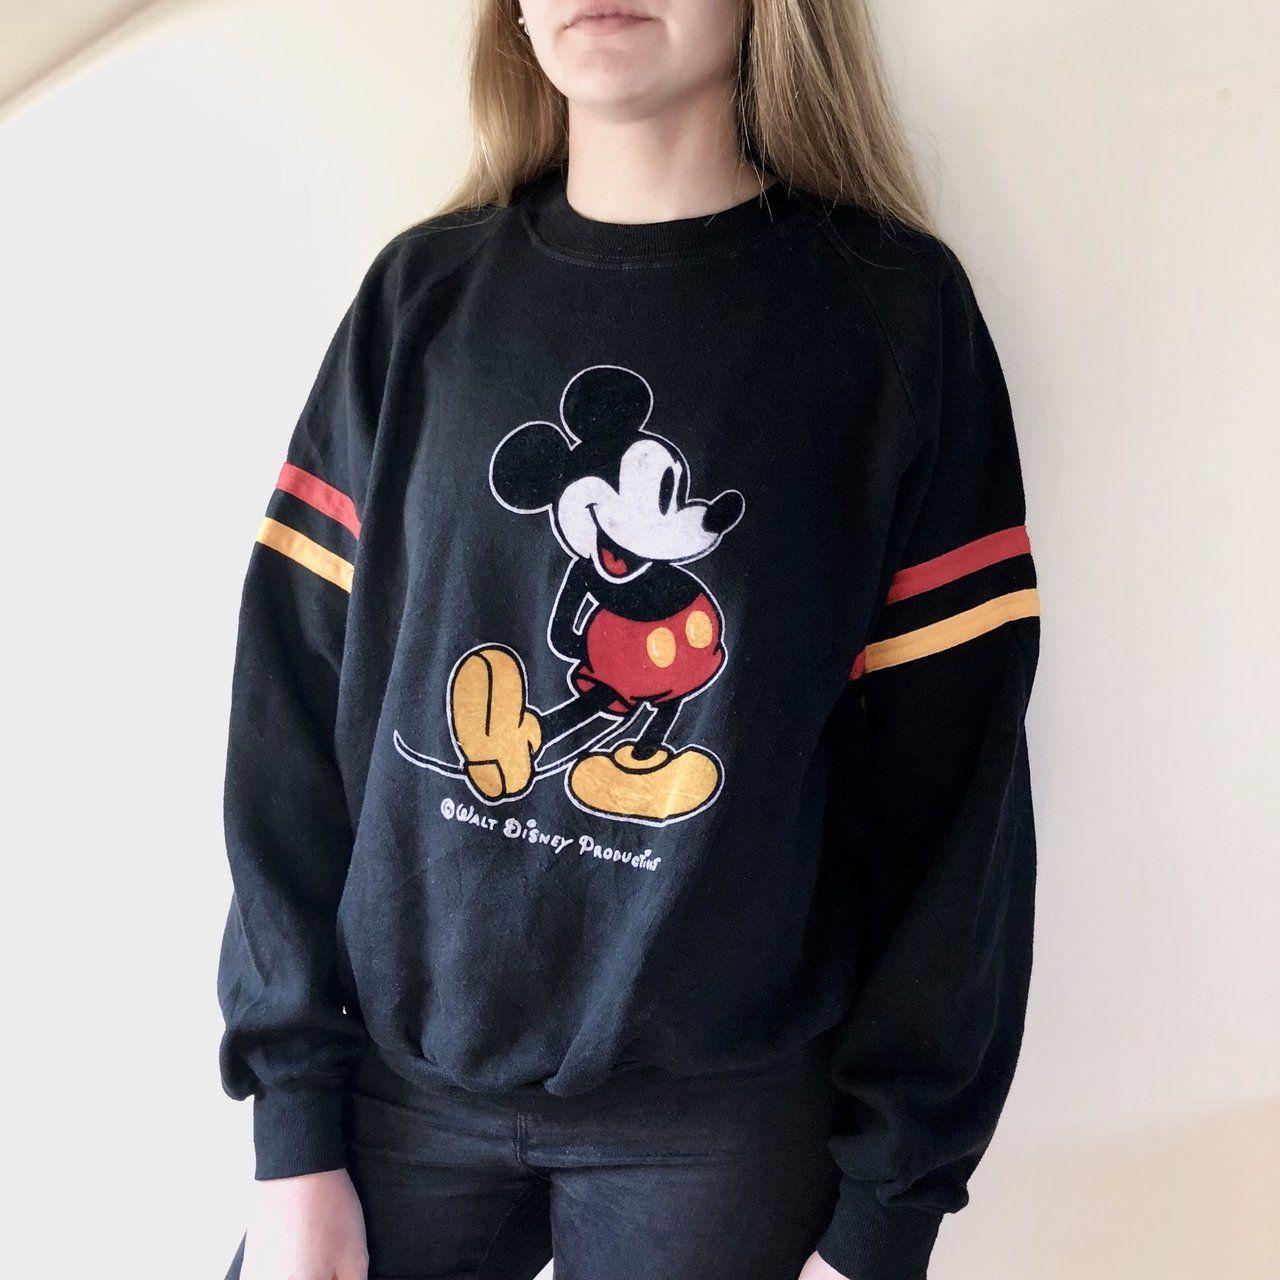 42296463a2b3 Properly retro black 80s - 90s Walt Disney sweatshirt, felt - Depop